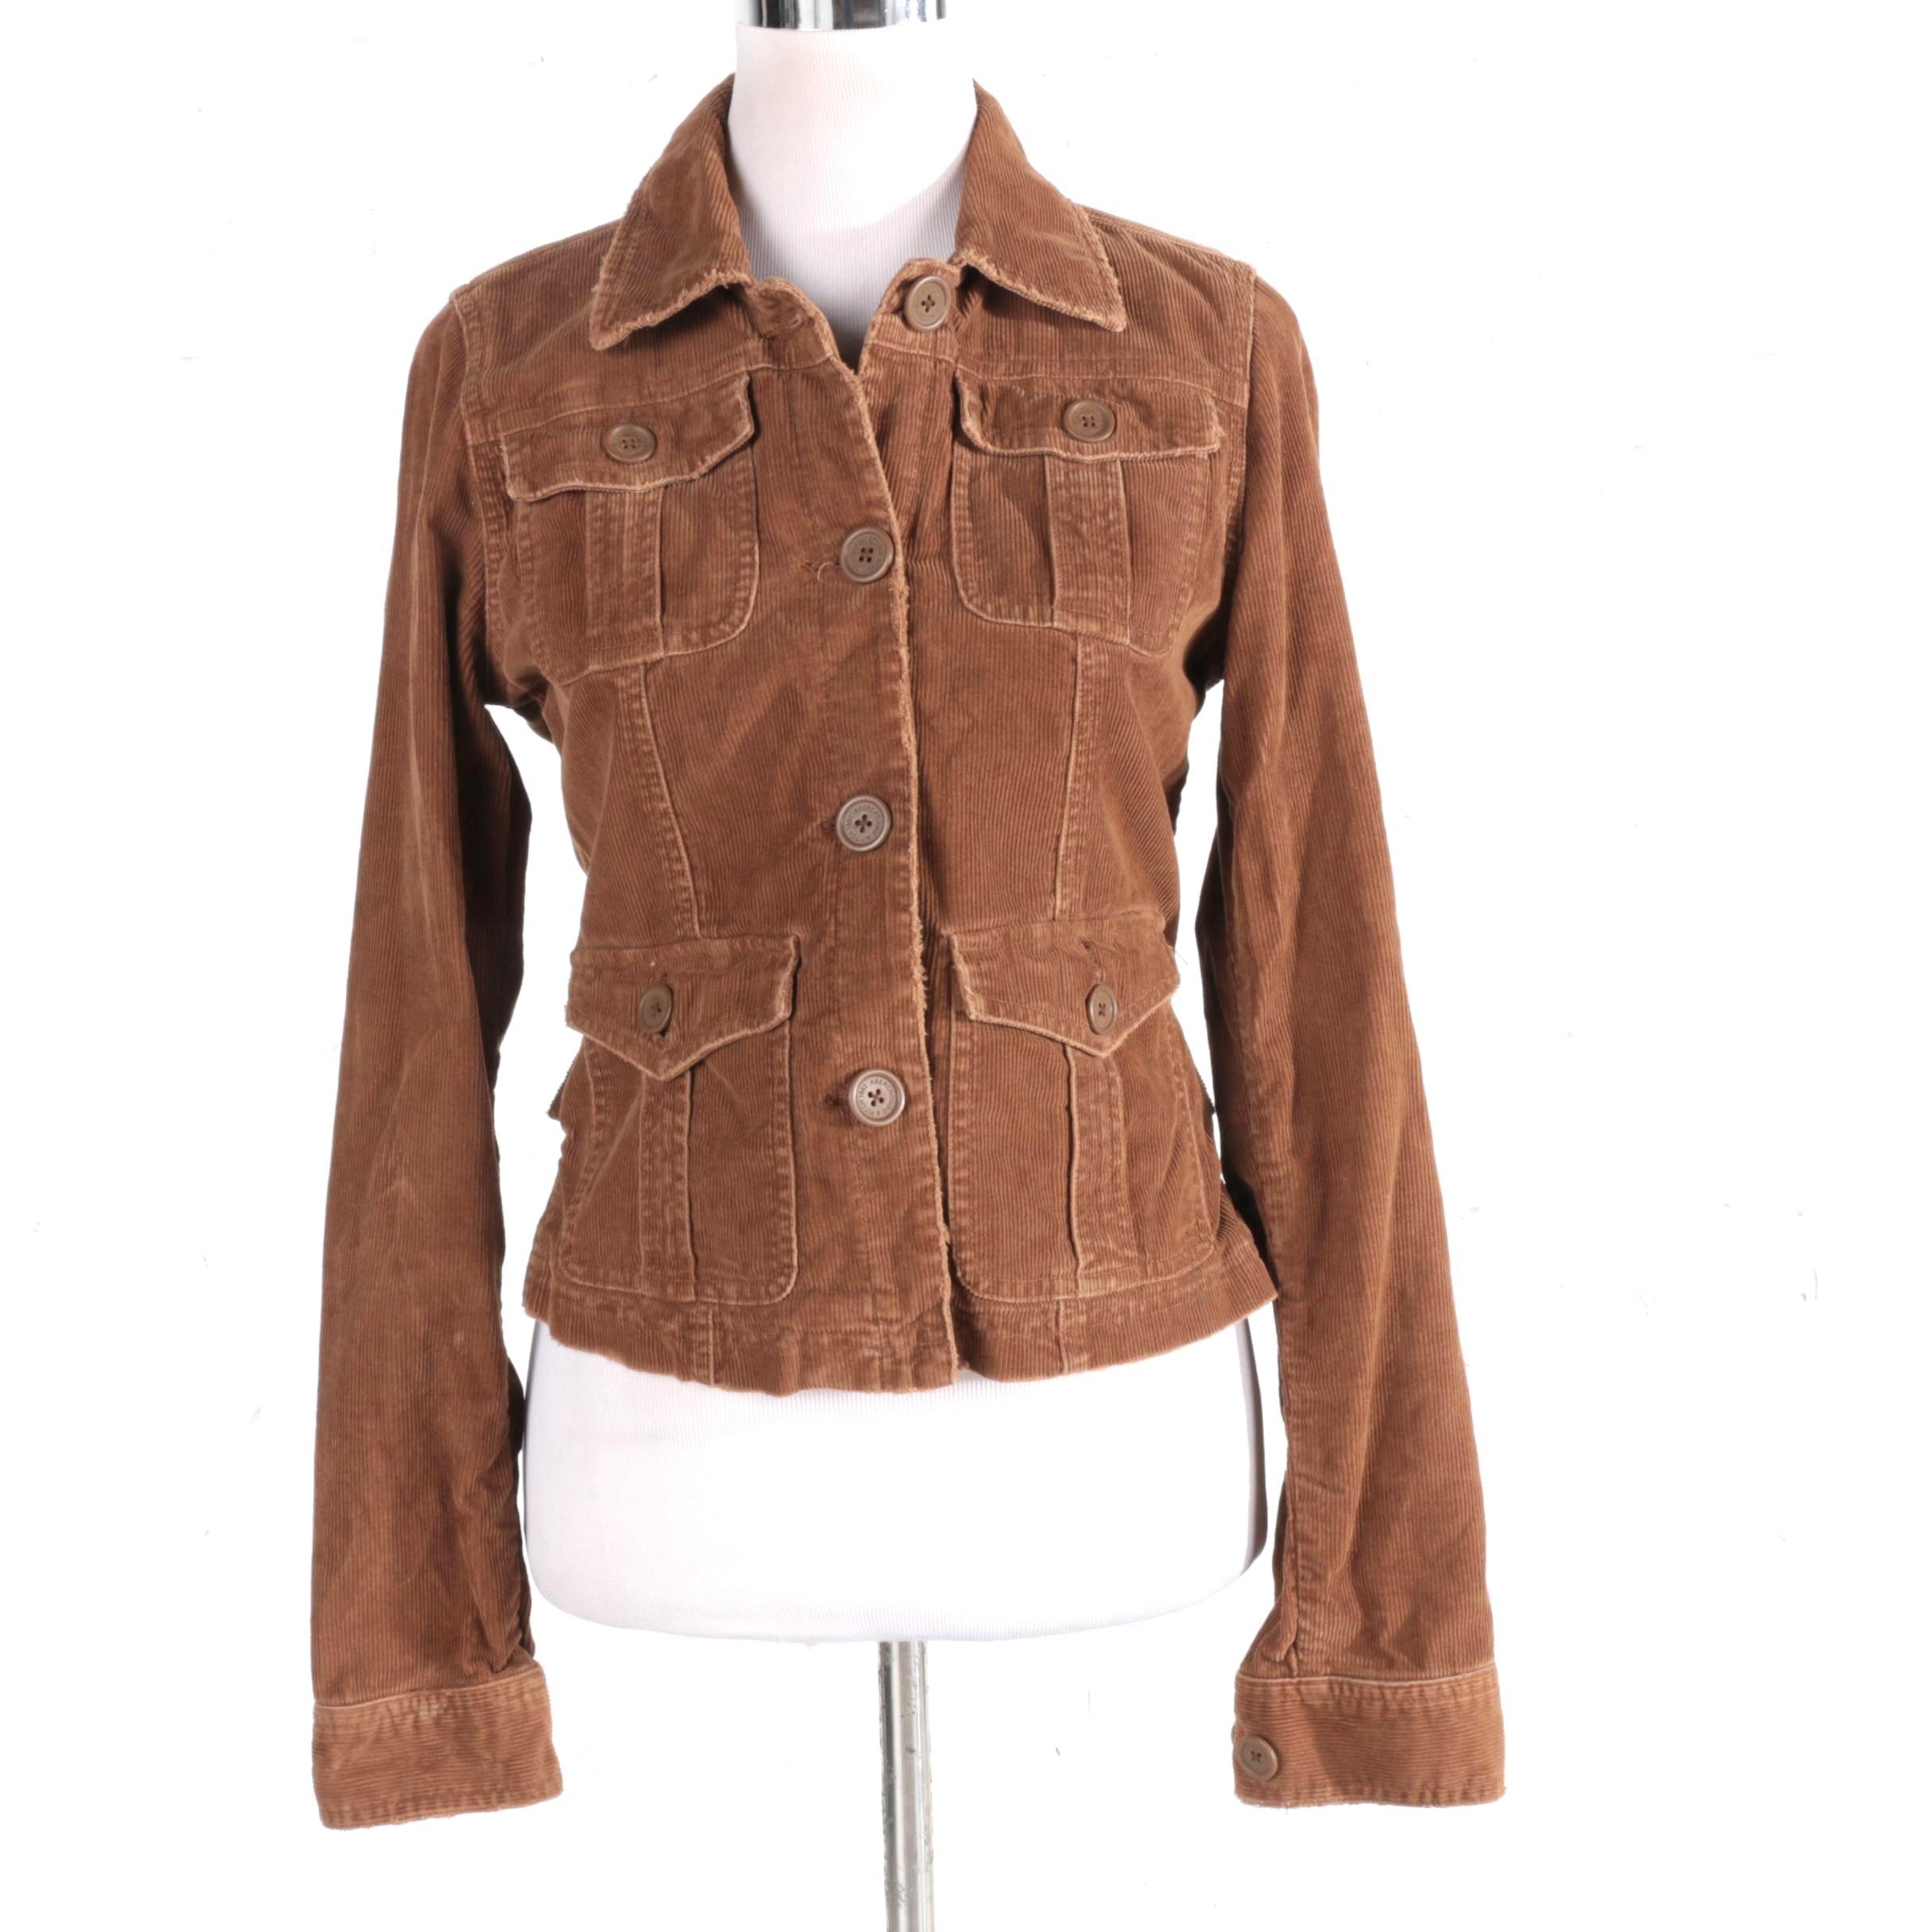 Abercrombie & Fitch Women's Corduroy Jacket